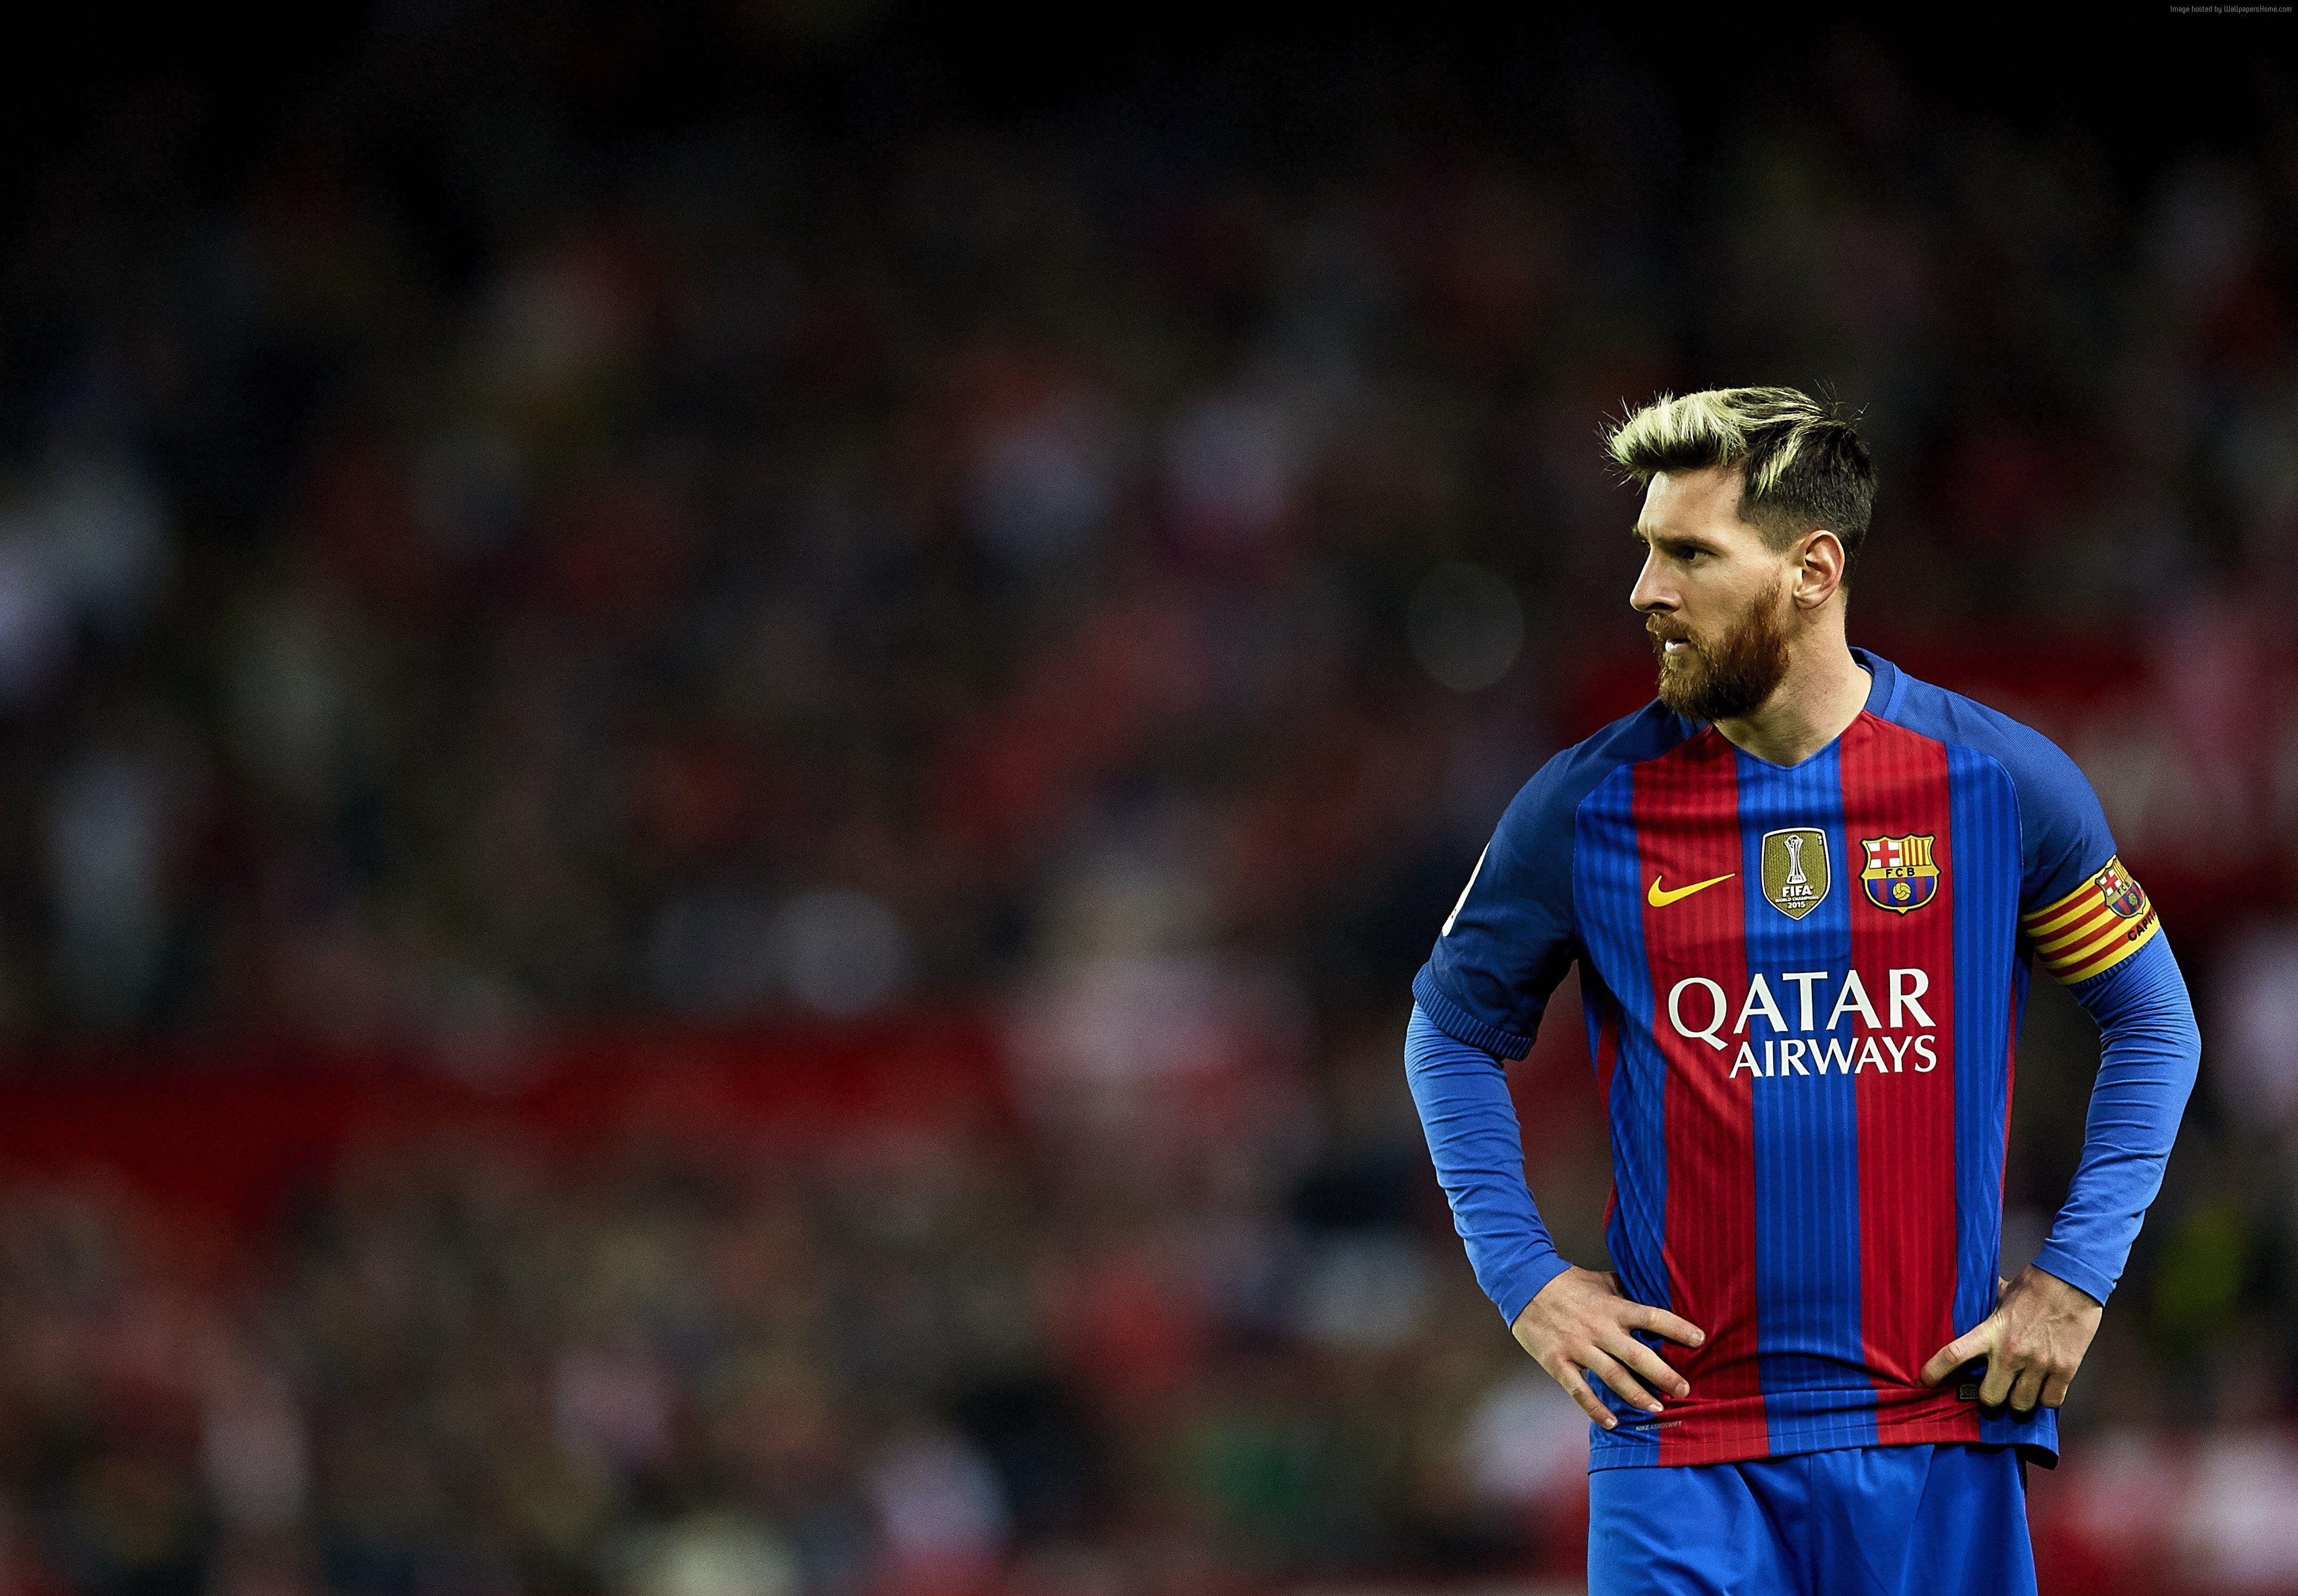 Barcelona 4k Soccer Fcb Lionel Messi 4k Wallpaper Hdwallpaper Desktop Lionel Messi Barcelona Messi